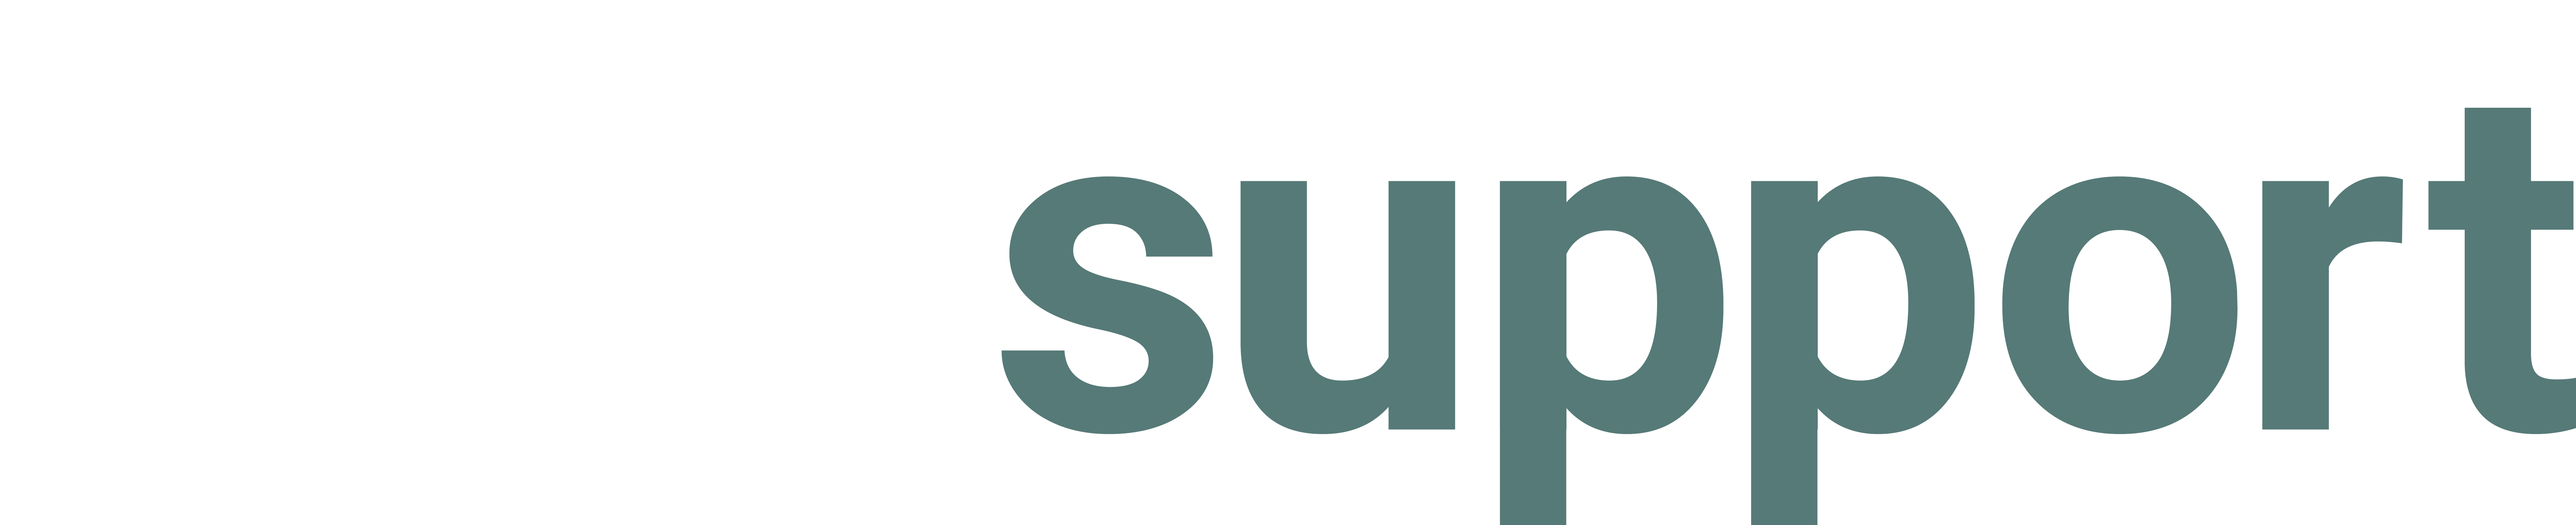 Klix support